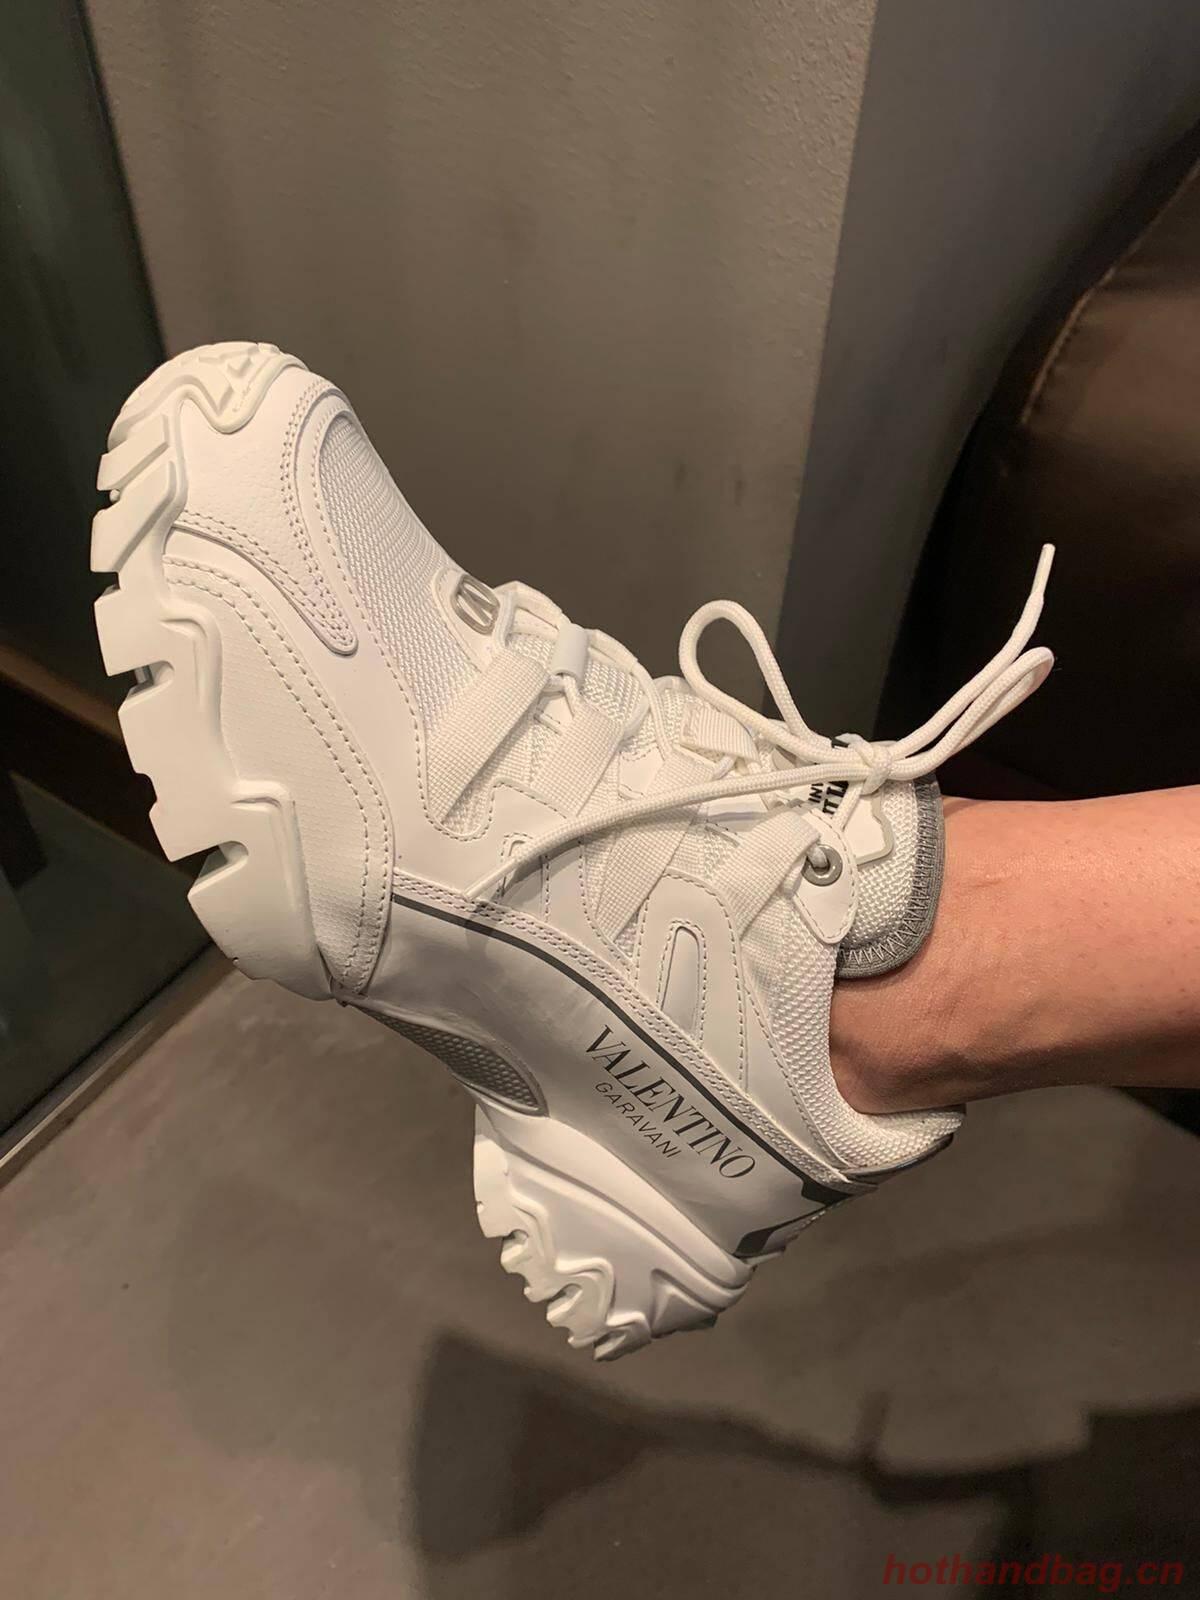 Balenciaga SNEAKER Shoes BL637 White